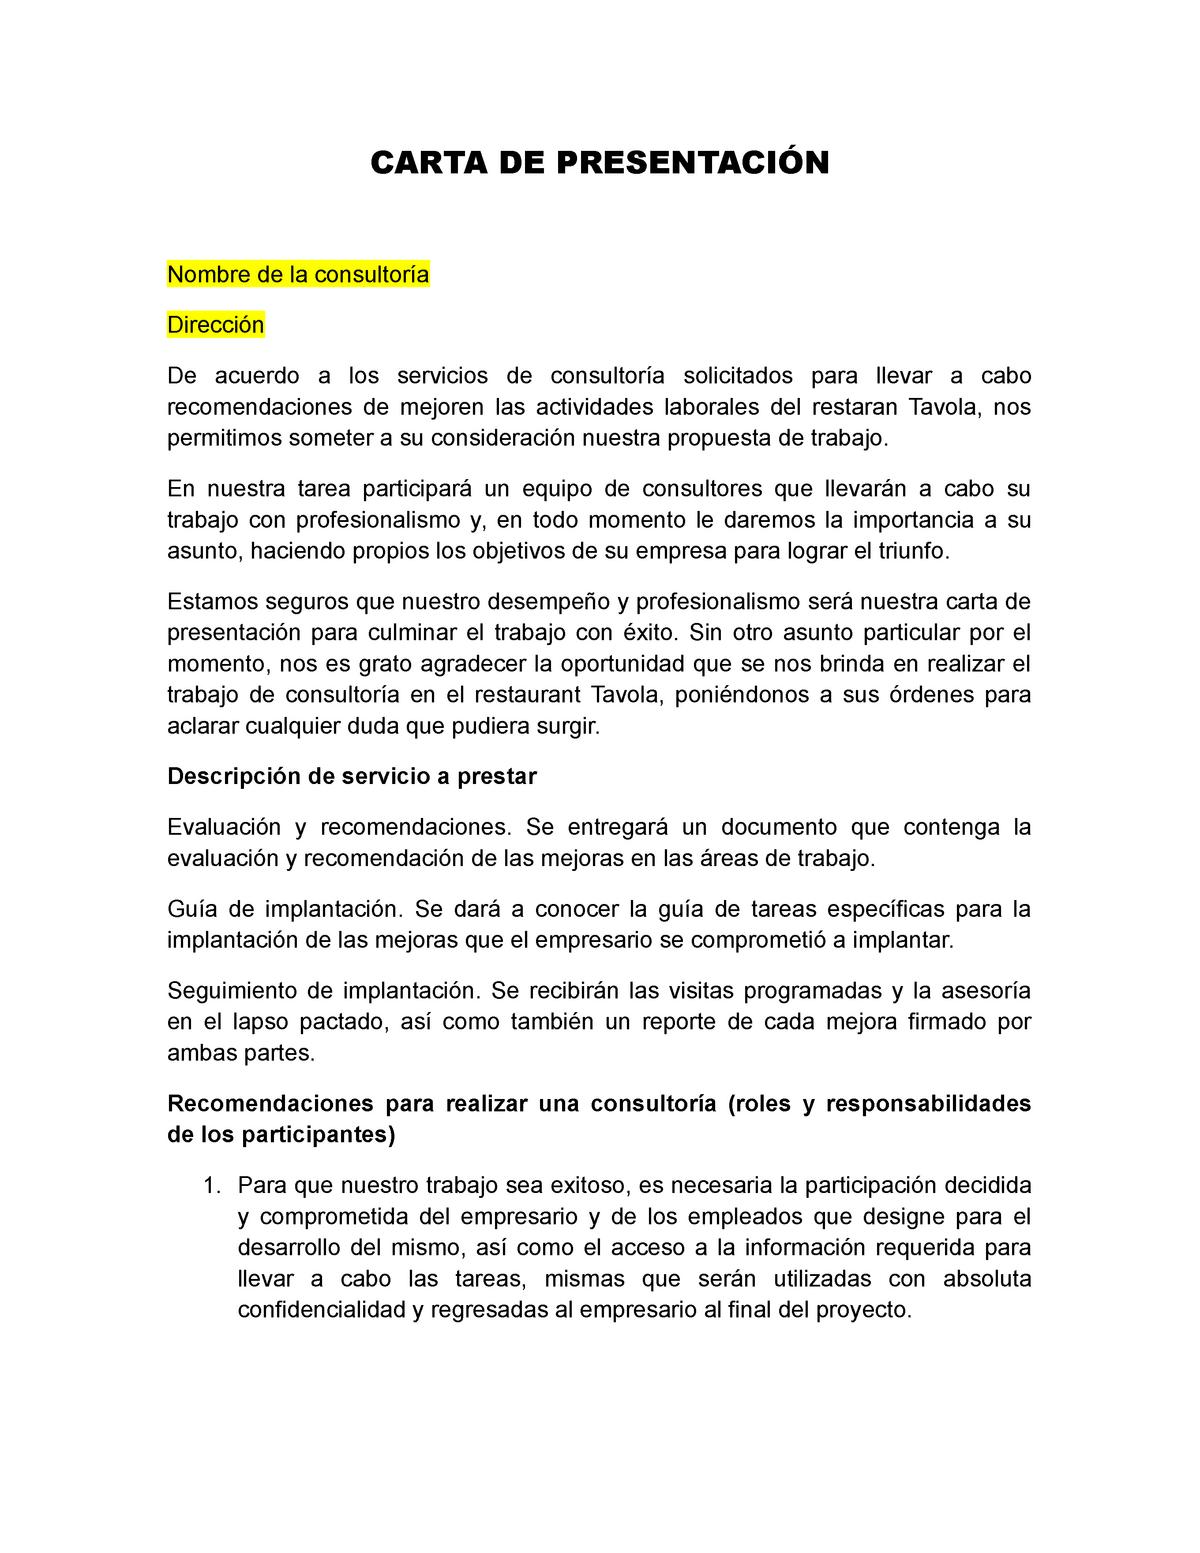 Carta De Presentacion Consultoria Adh 1011 Studocu